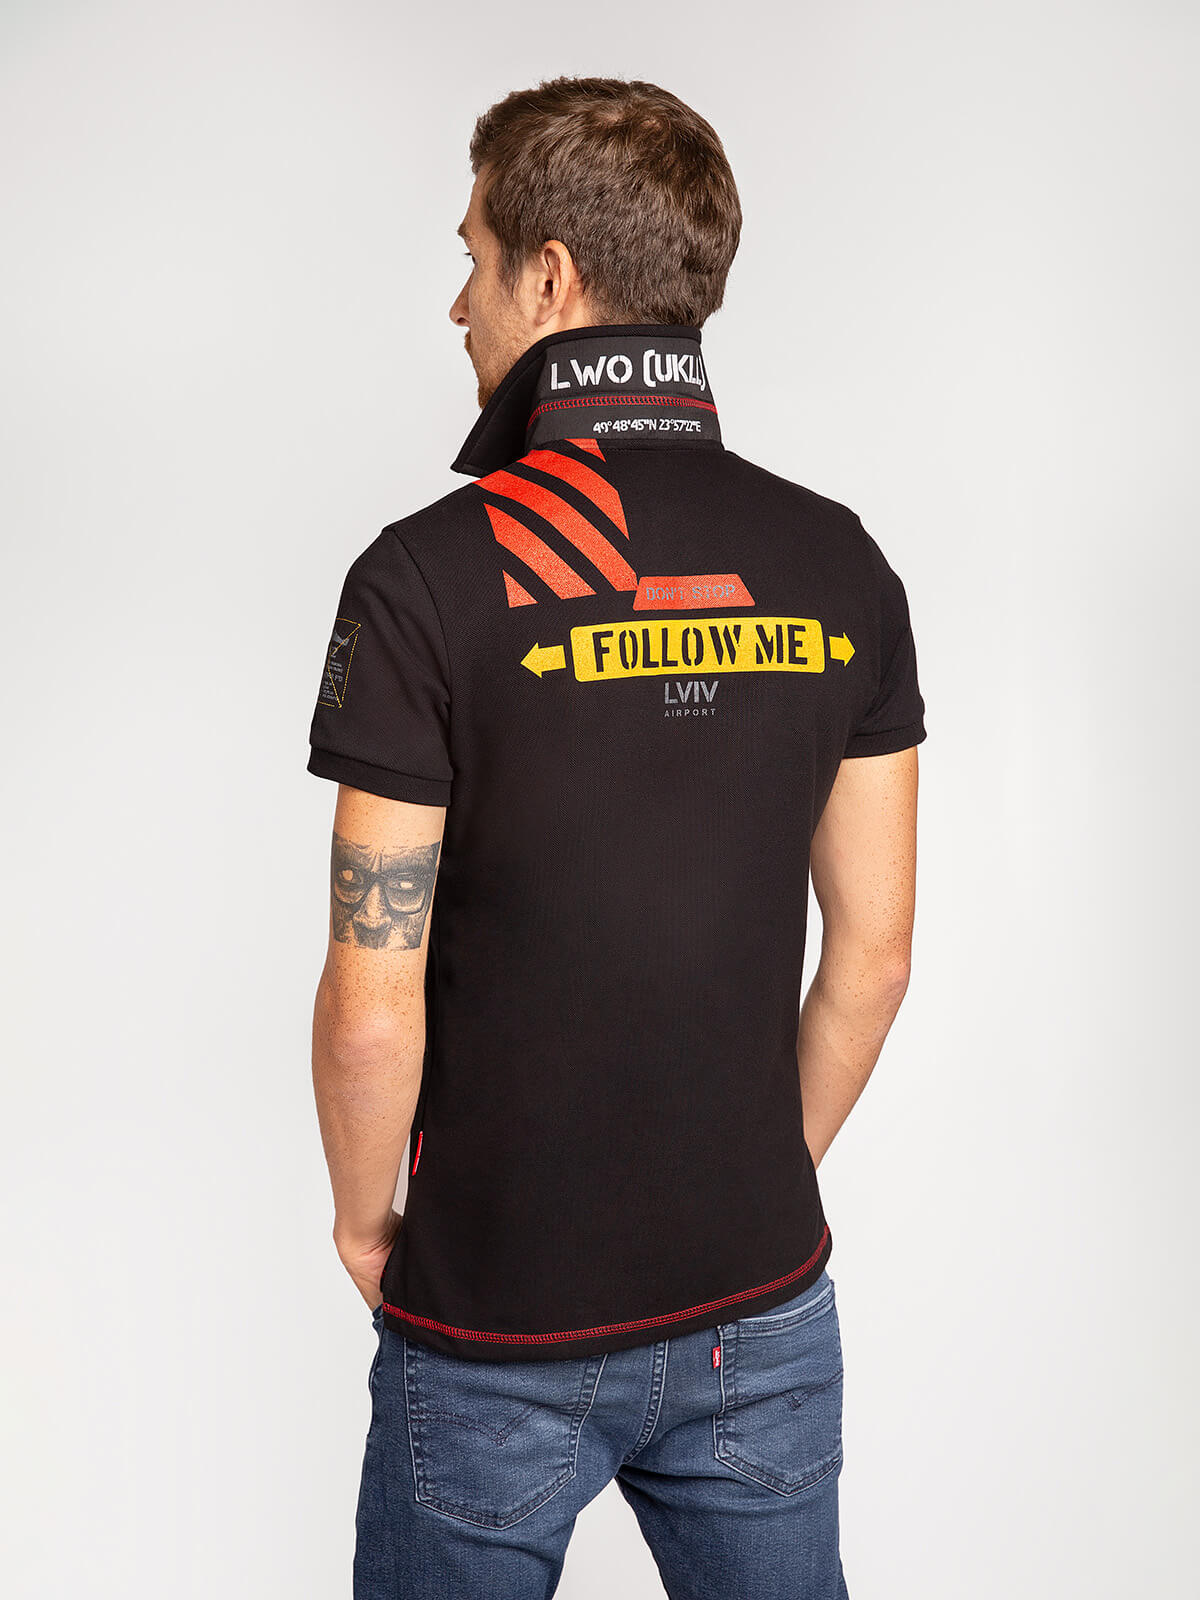 Men's Polo Shirt Lwo. Color black.  Technique of prints applied: embroidery, silkscreen printing.